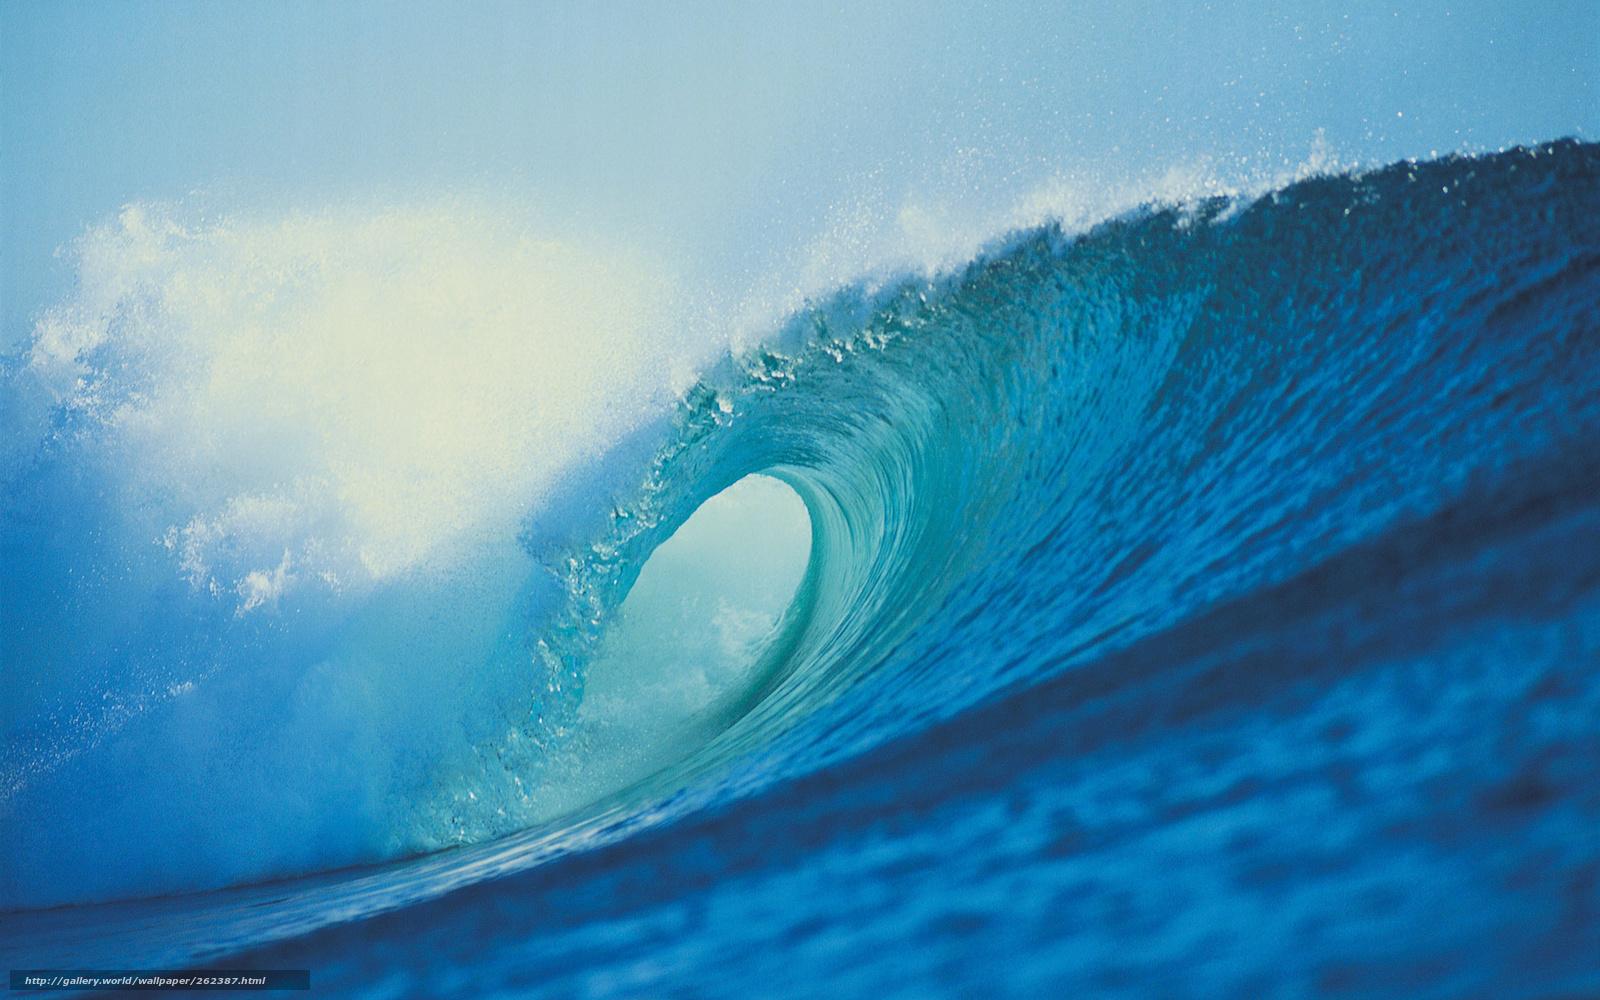 Wave Wallpaper High Resolution Free Ocean Waves Wallp...